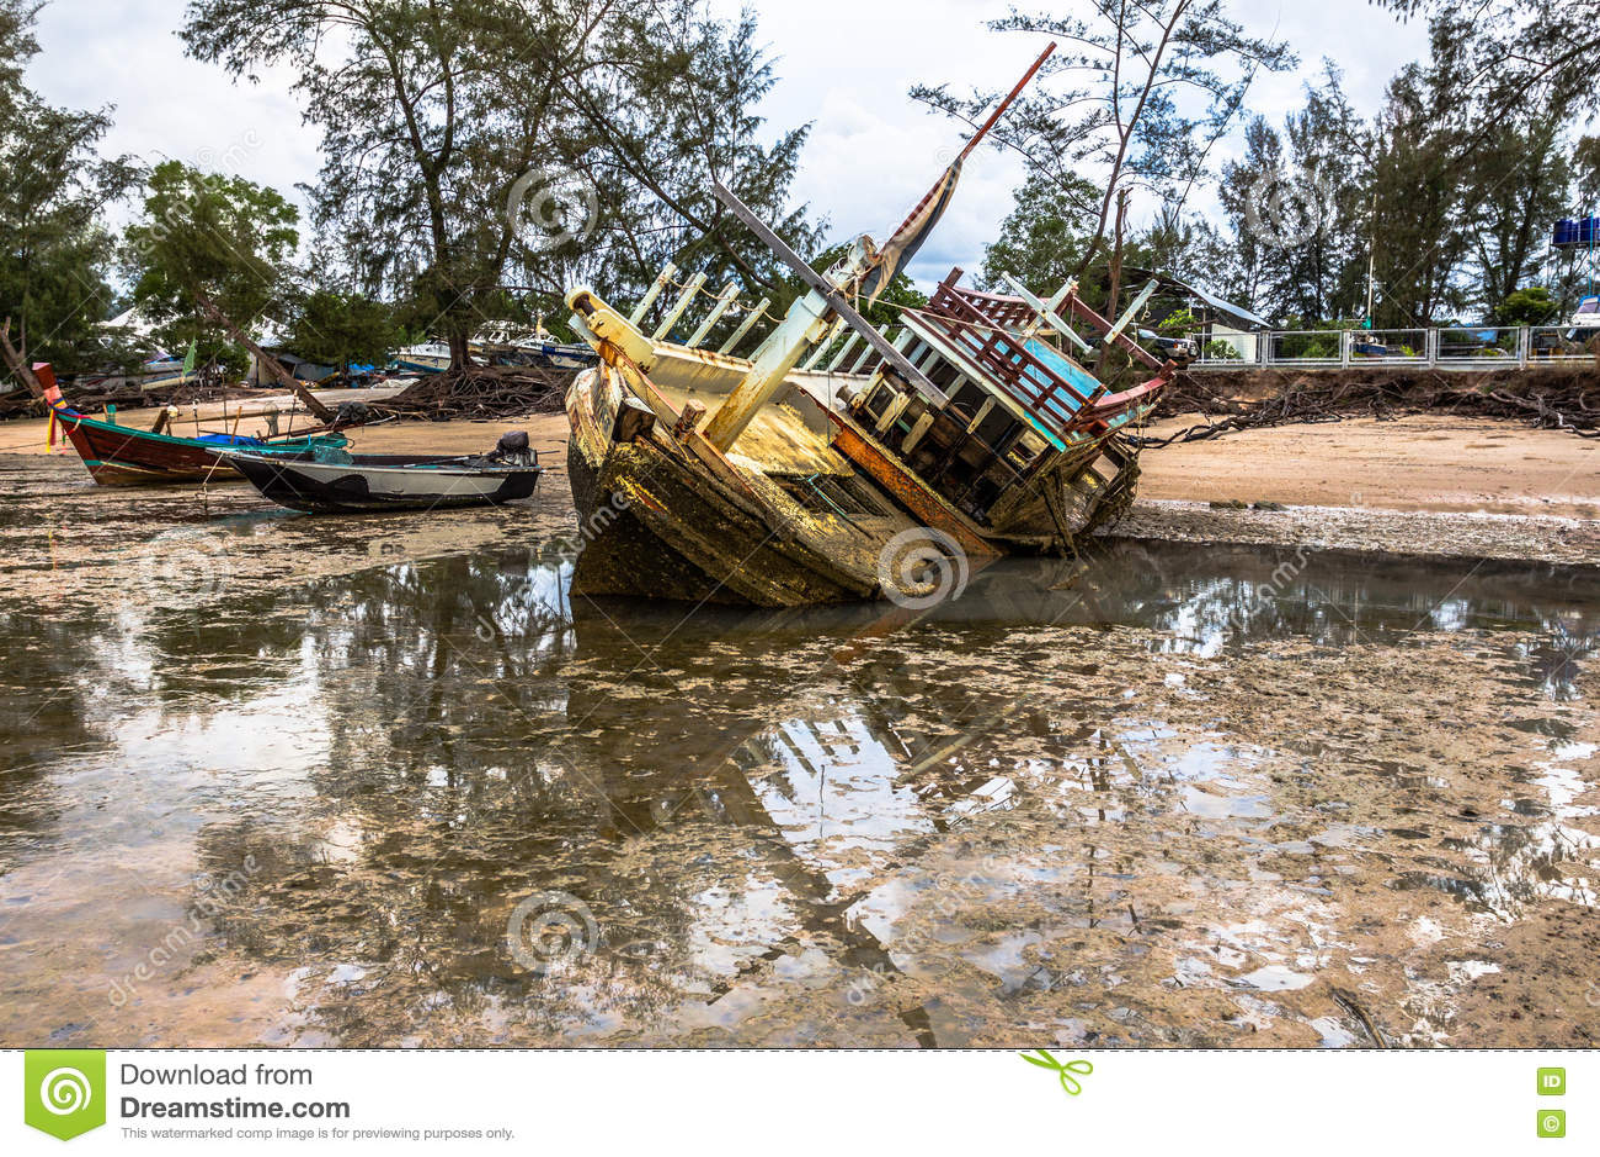 Wreck Fishing Boat Damaged Parked On Wetlands Stock Image